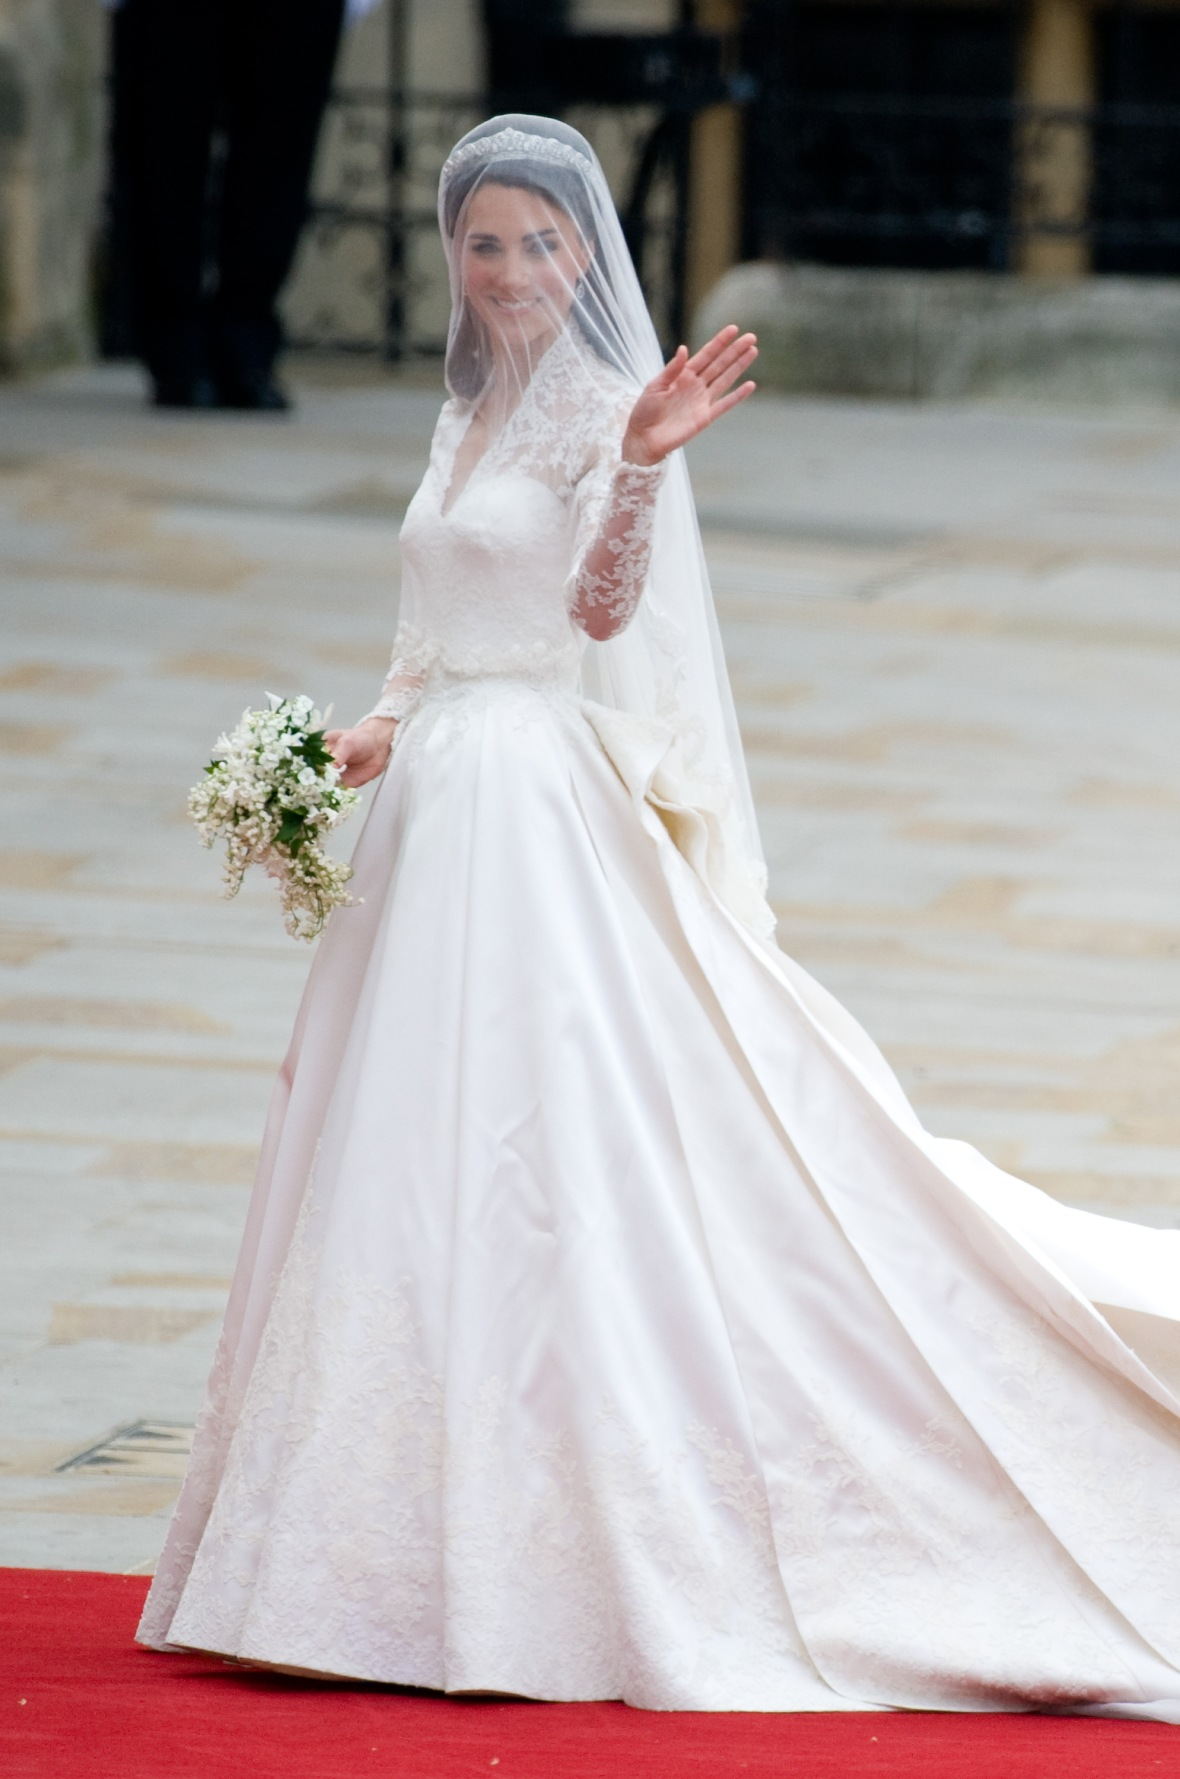 kate middleton wedding dress getty images